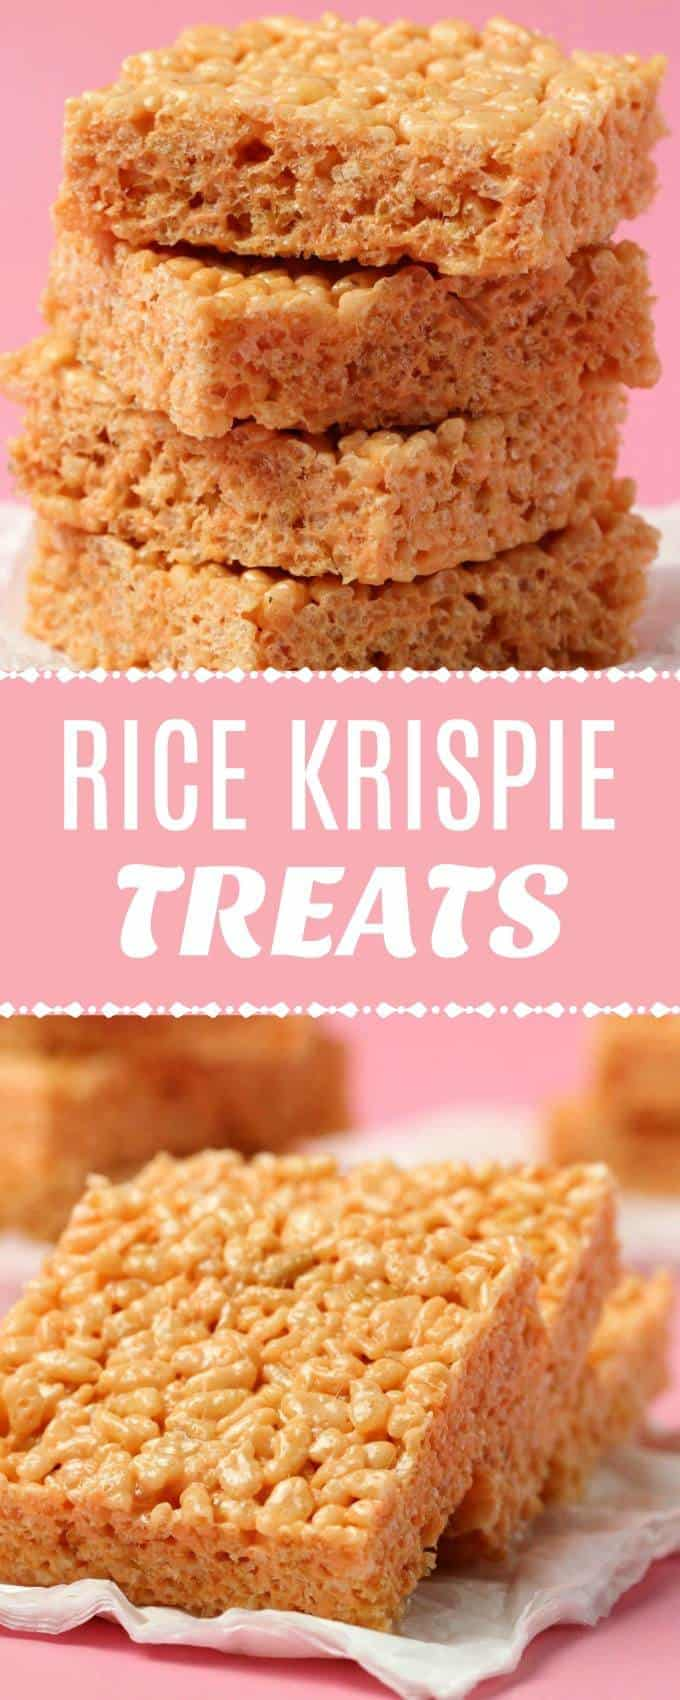 Fabulously crispy vegan rice krispie treats made with vegan marshmallows! Perfectly sweet and simple 4-ingredient recipe. Ready in 10 minutes! | lovingitvegan.com